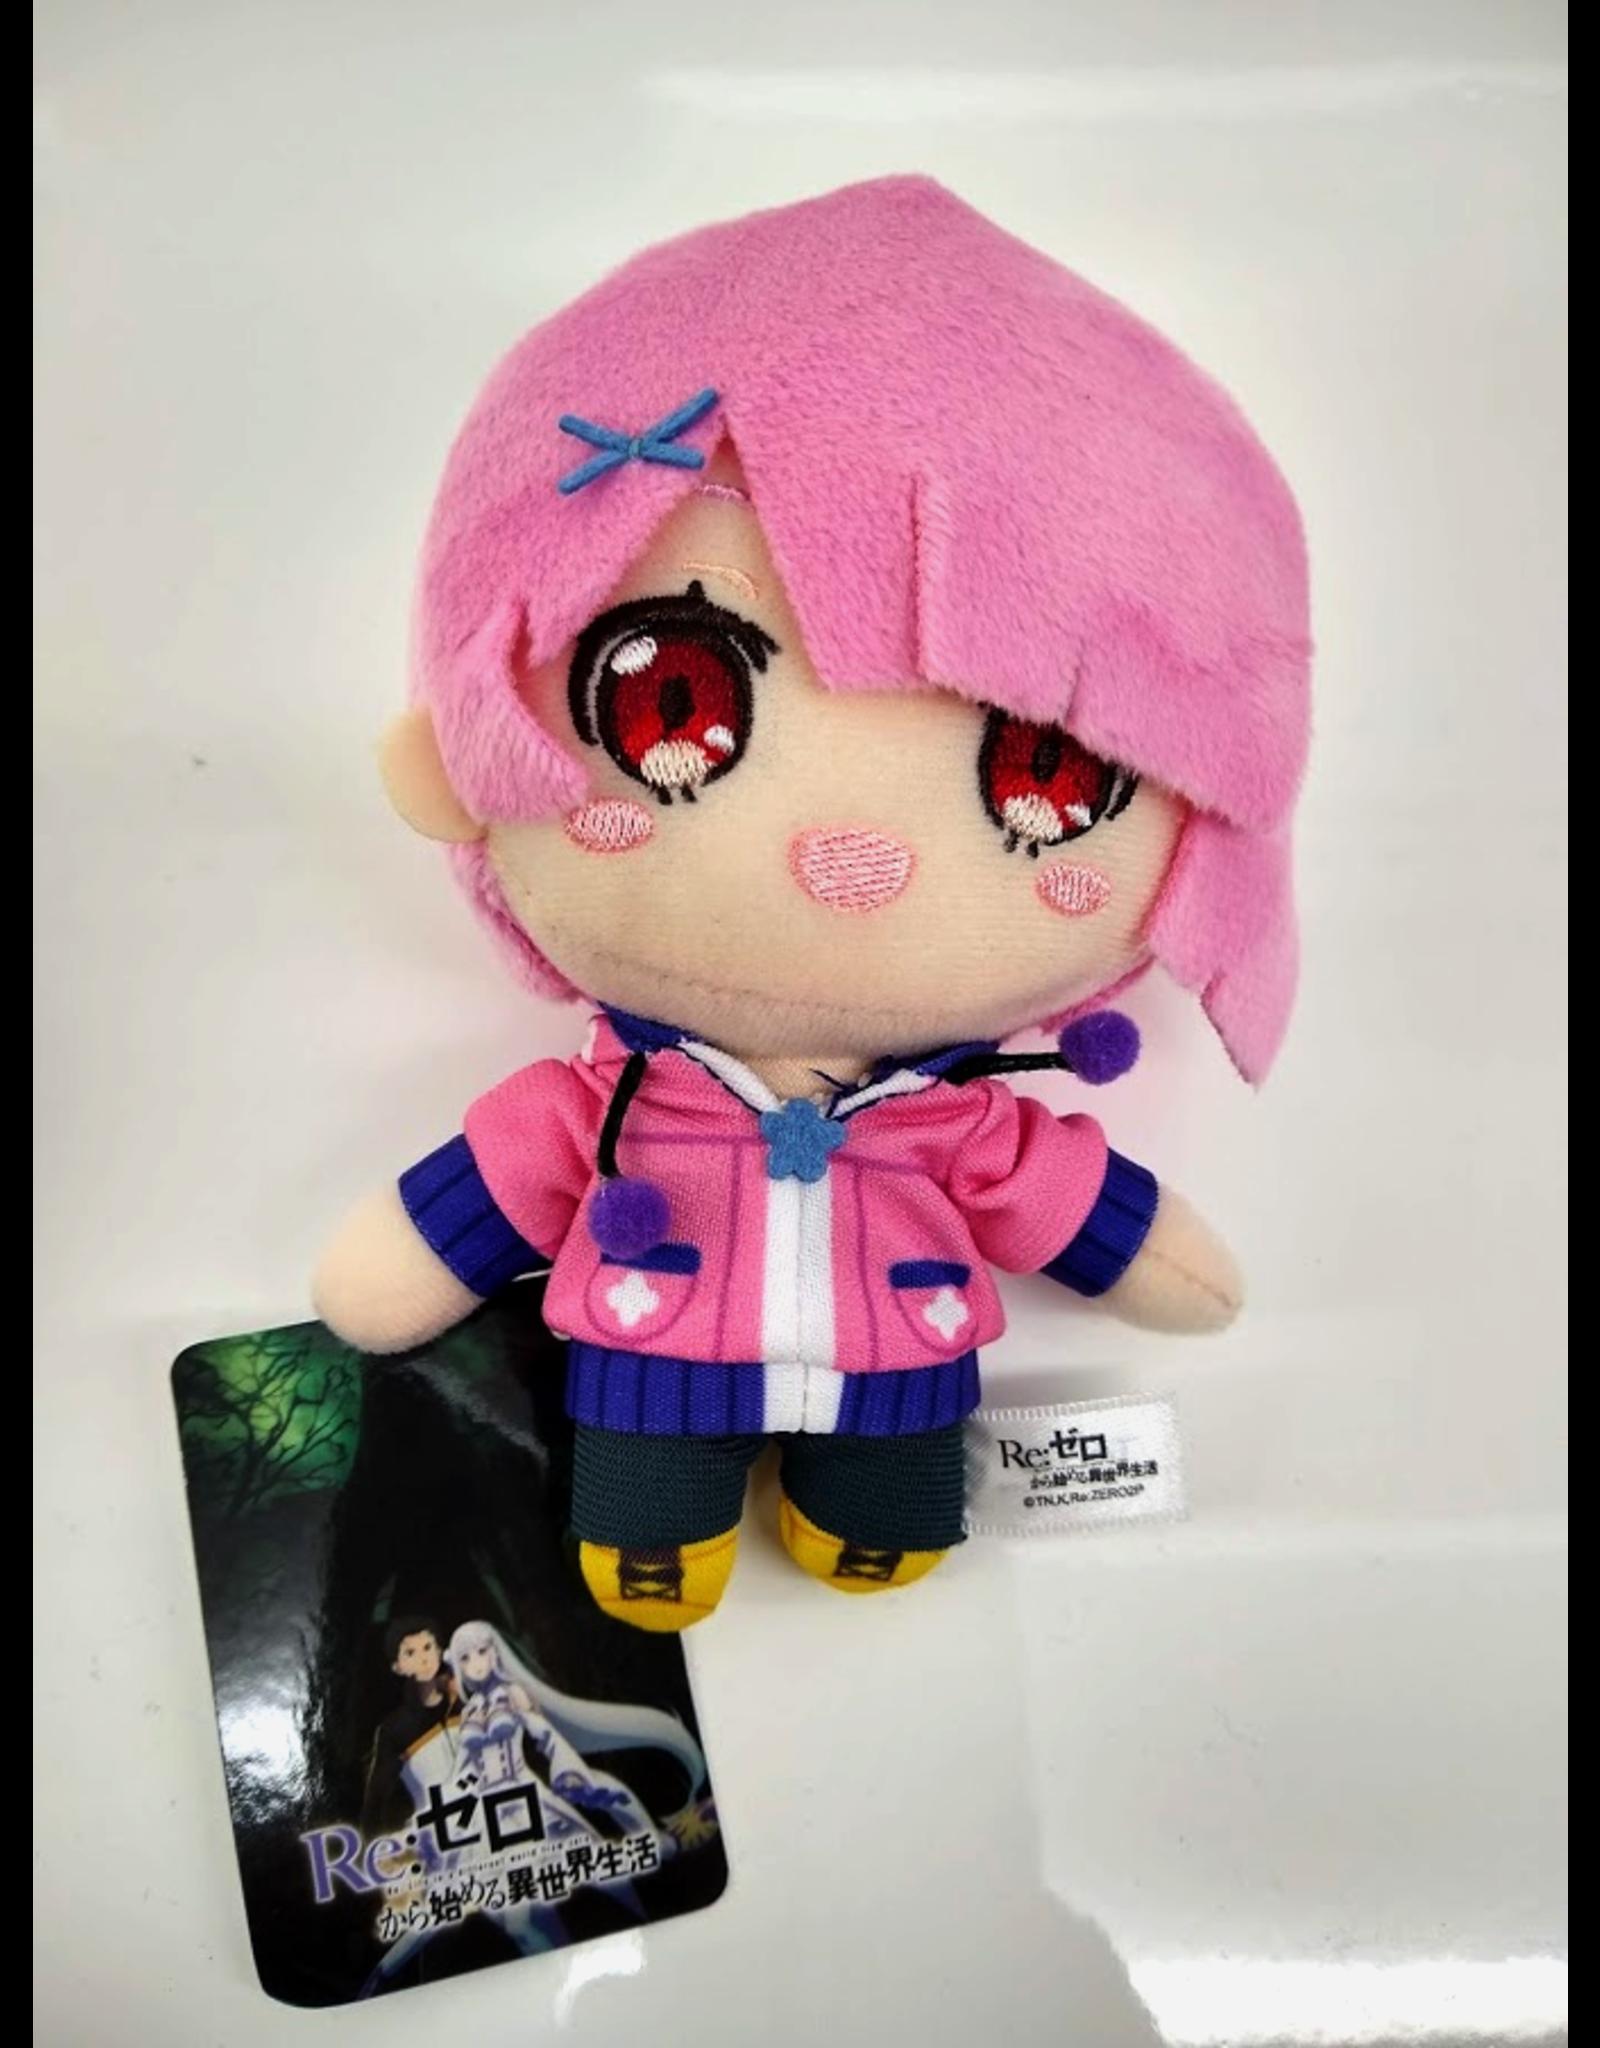 Re:Zero Mascot Plush - Ram Pink Jacket - Nesoberi Plush - 12cm